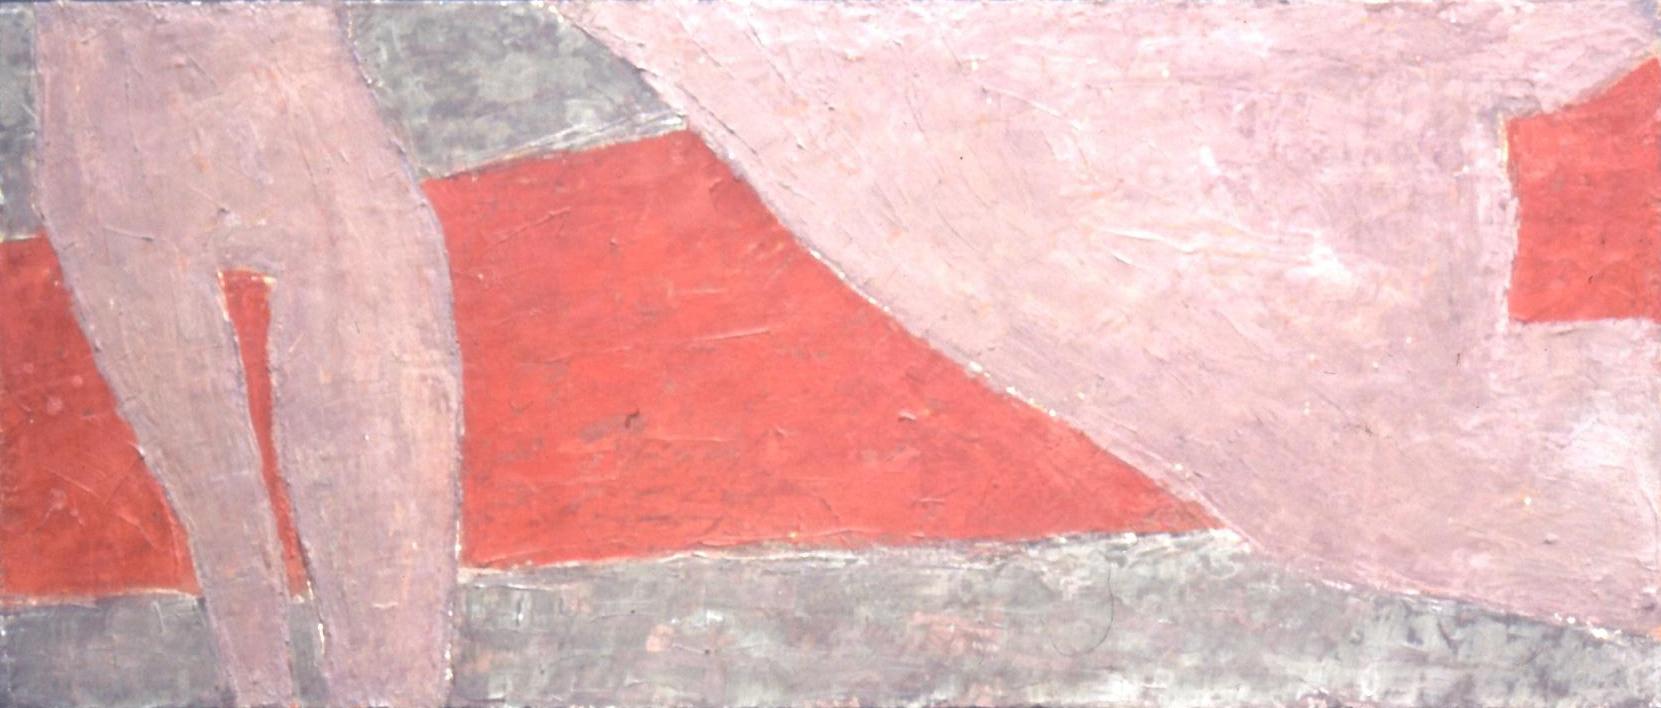 compositie 1959 rood